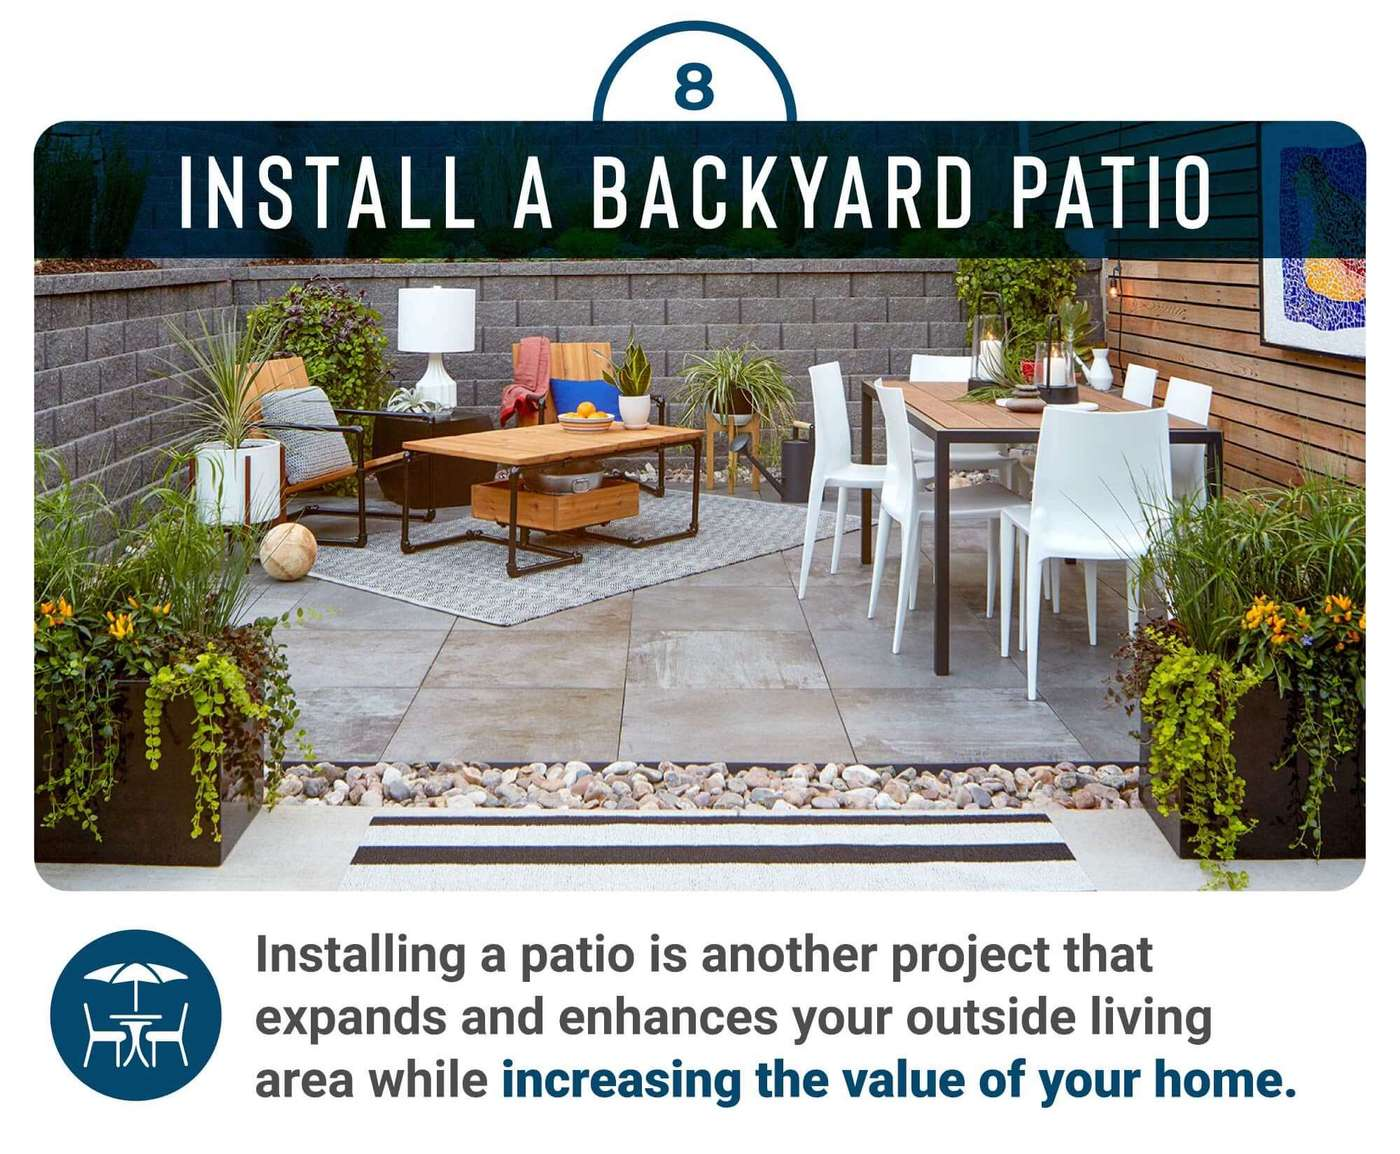 Install a backyard patio